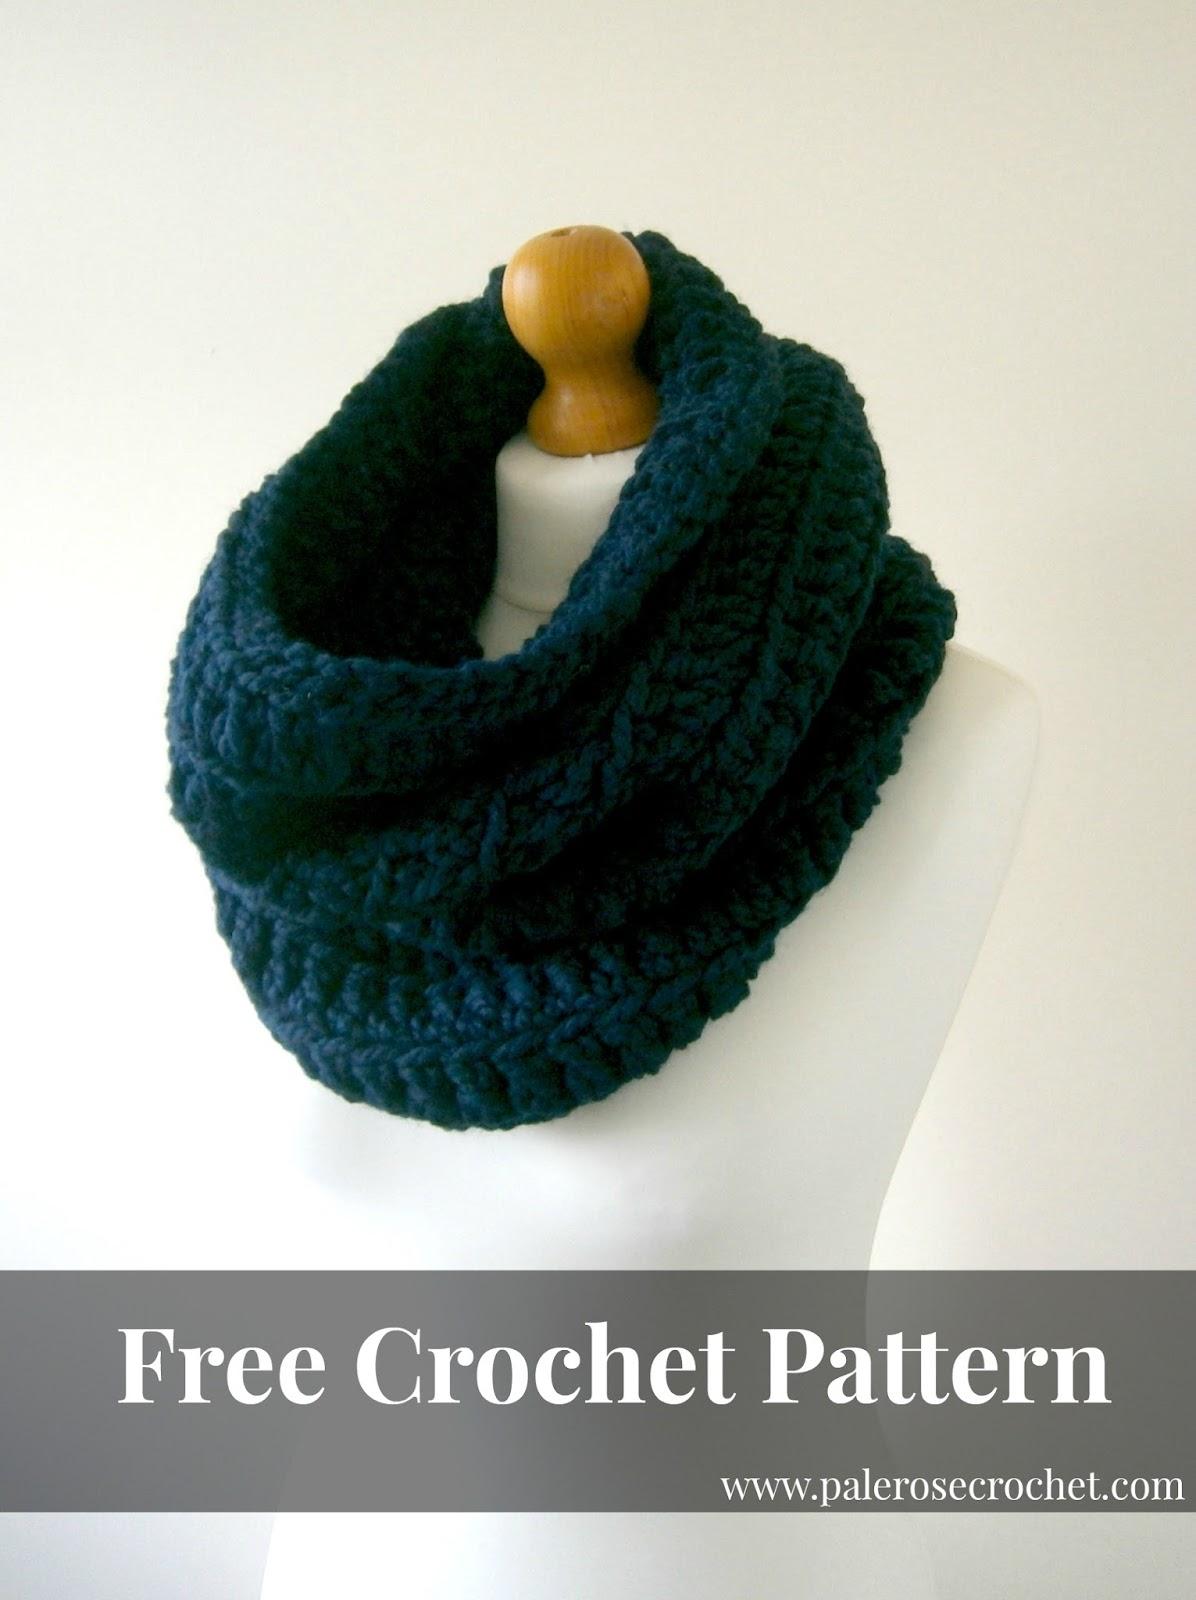 Crochet Patterns Galore - Wintery Cowl